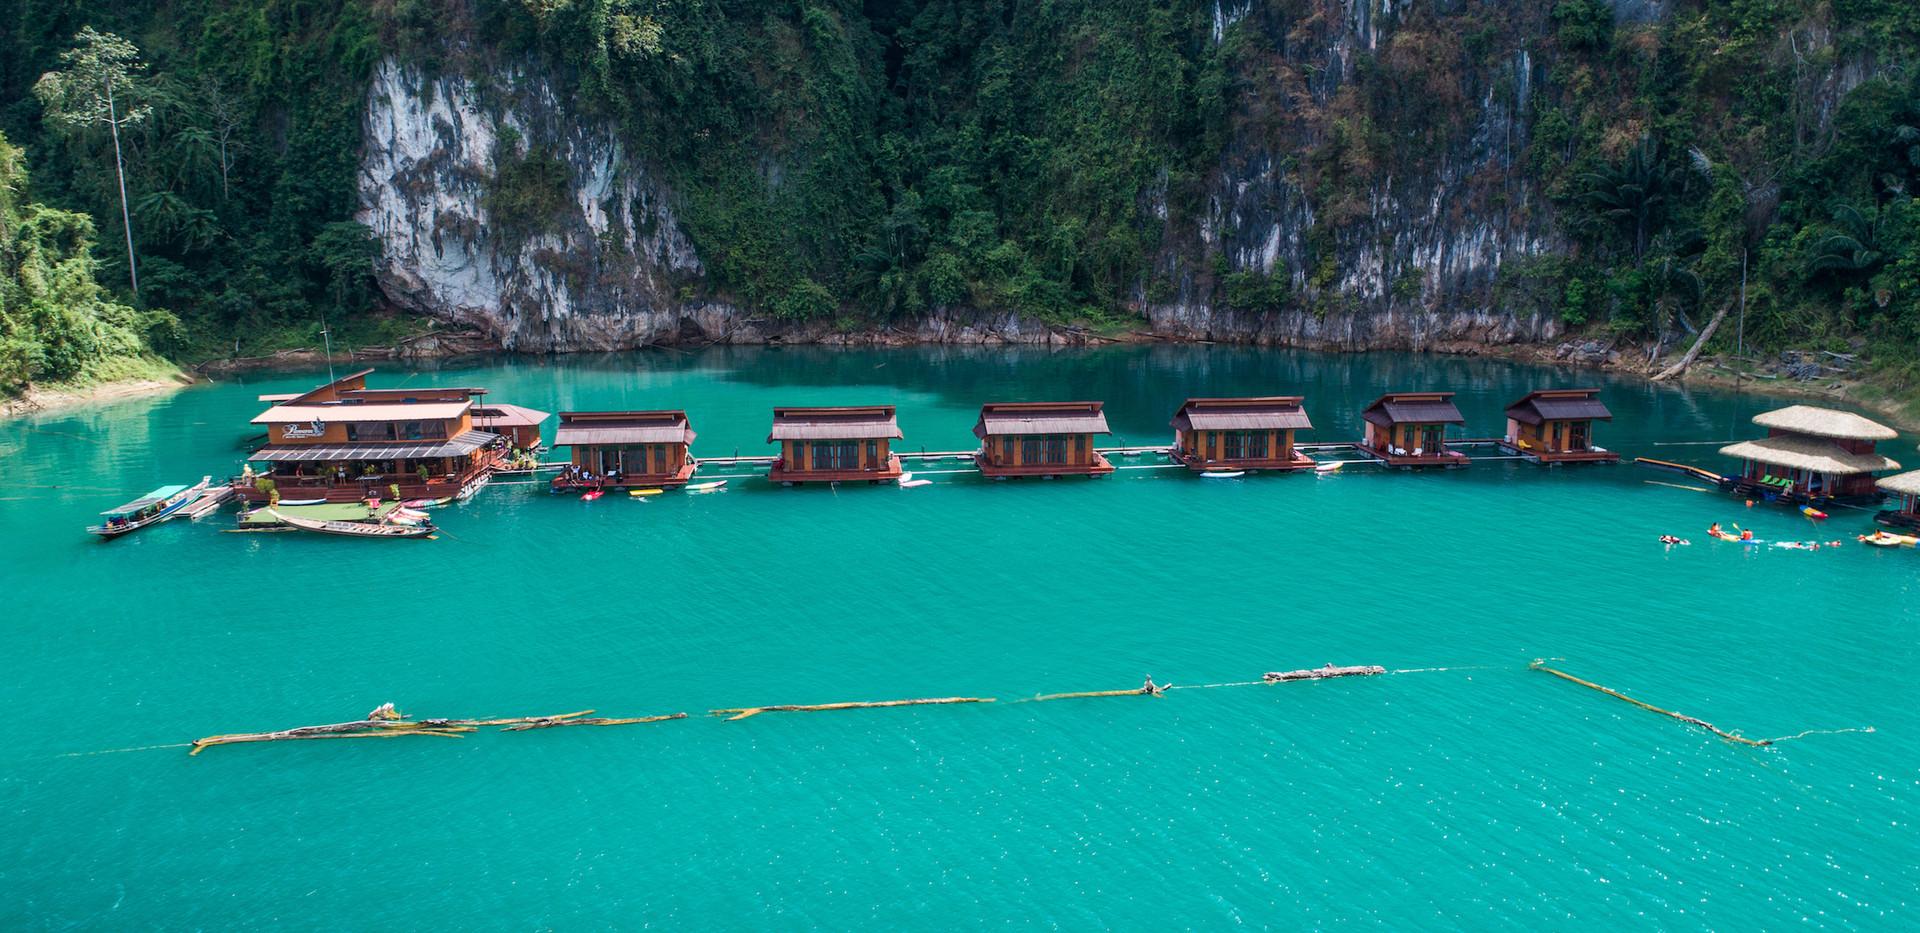 Thailand Yoga Holidays Destination Jungle Treehouse Accomodation